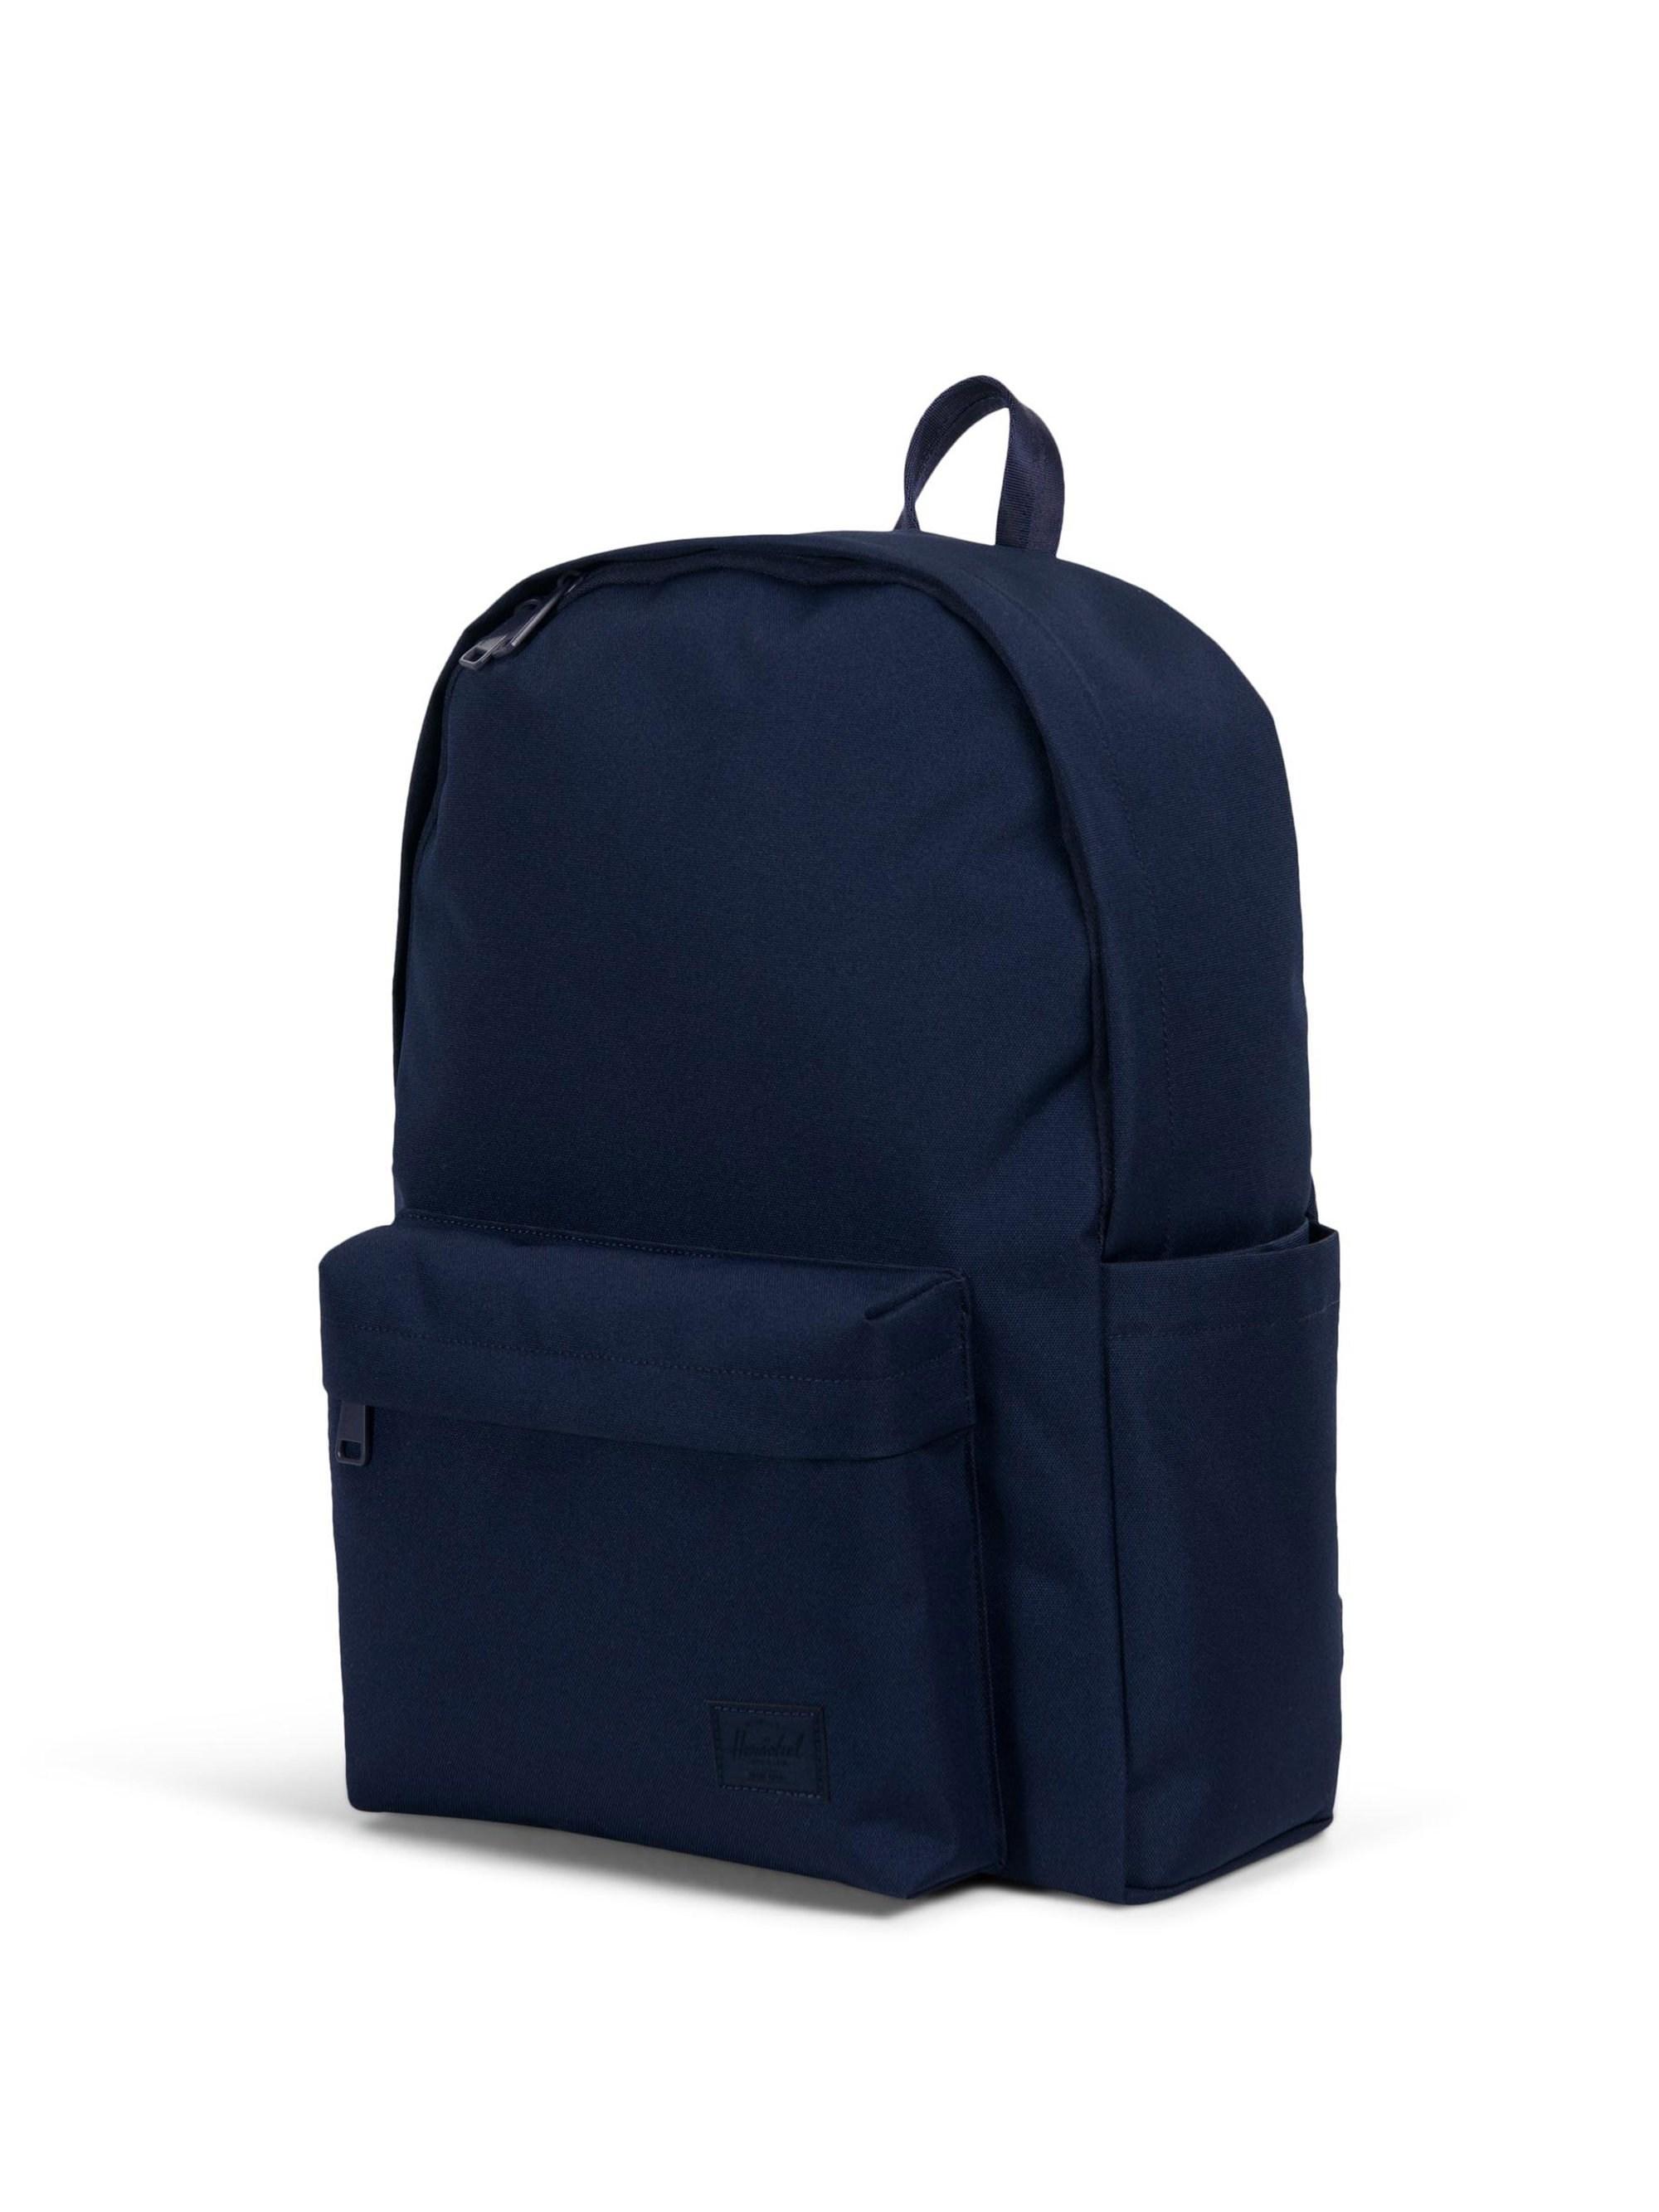 Herschel Supply Co. - Blue Berg Cordura Backpack for Men - Lyst. View  fullscreen 4a7fa4d91170b